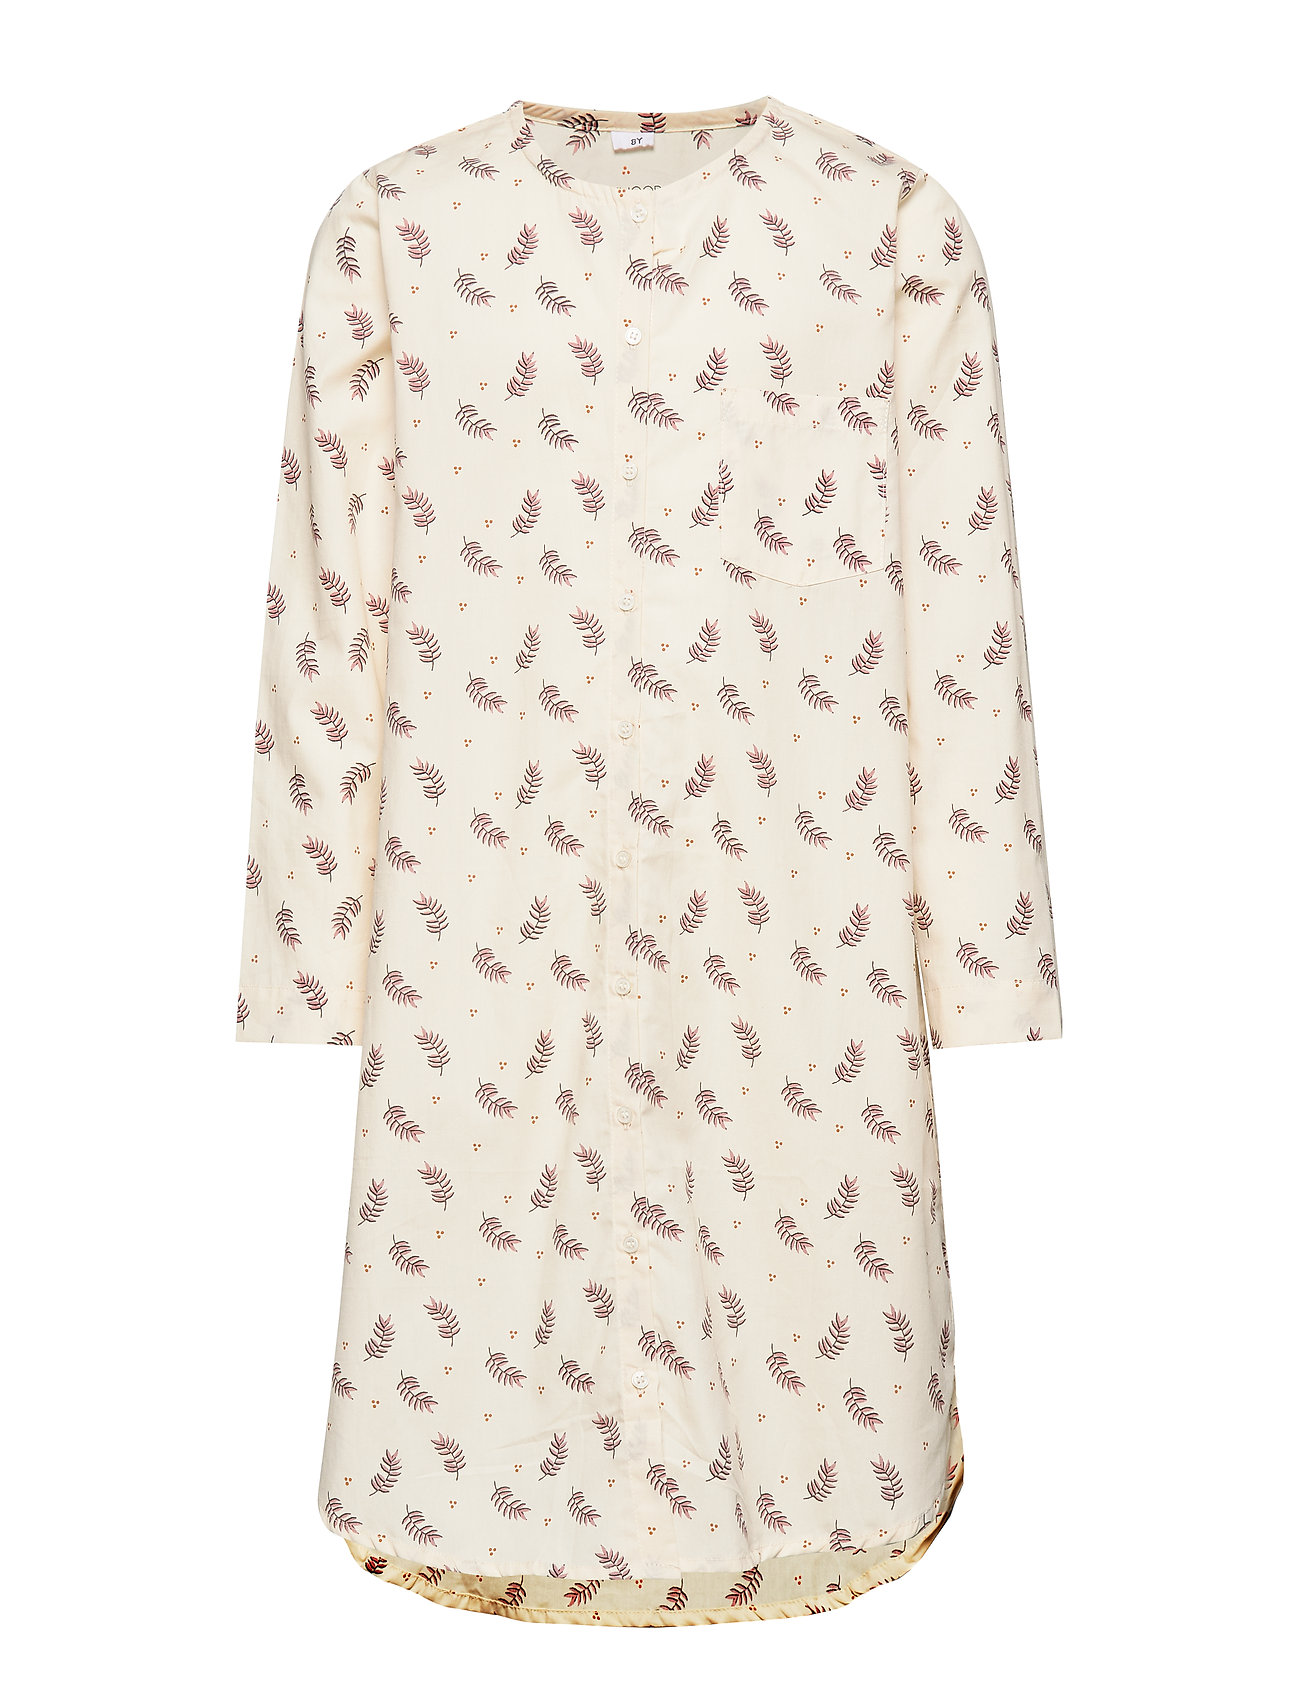 Liewood Evy Pyjamas Dress - FERN/ROSE